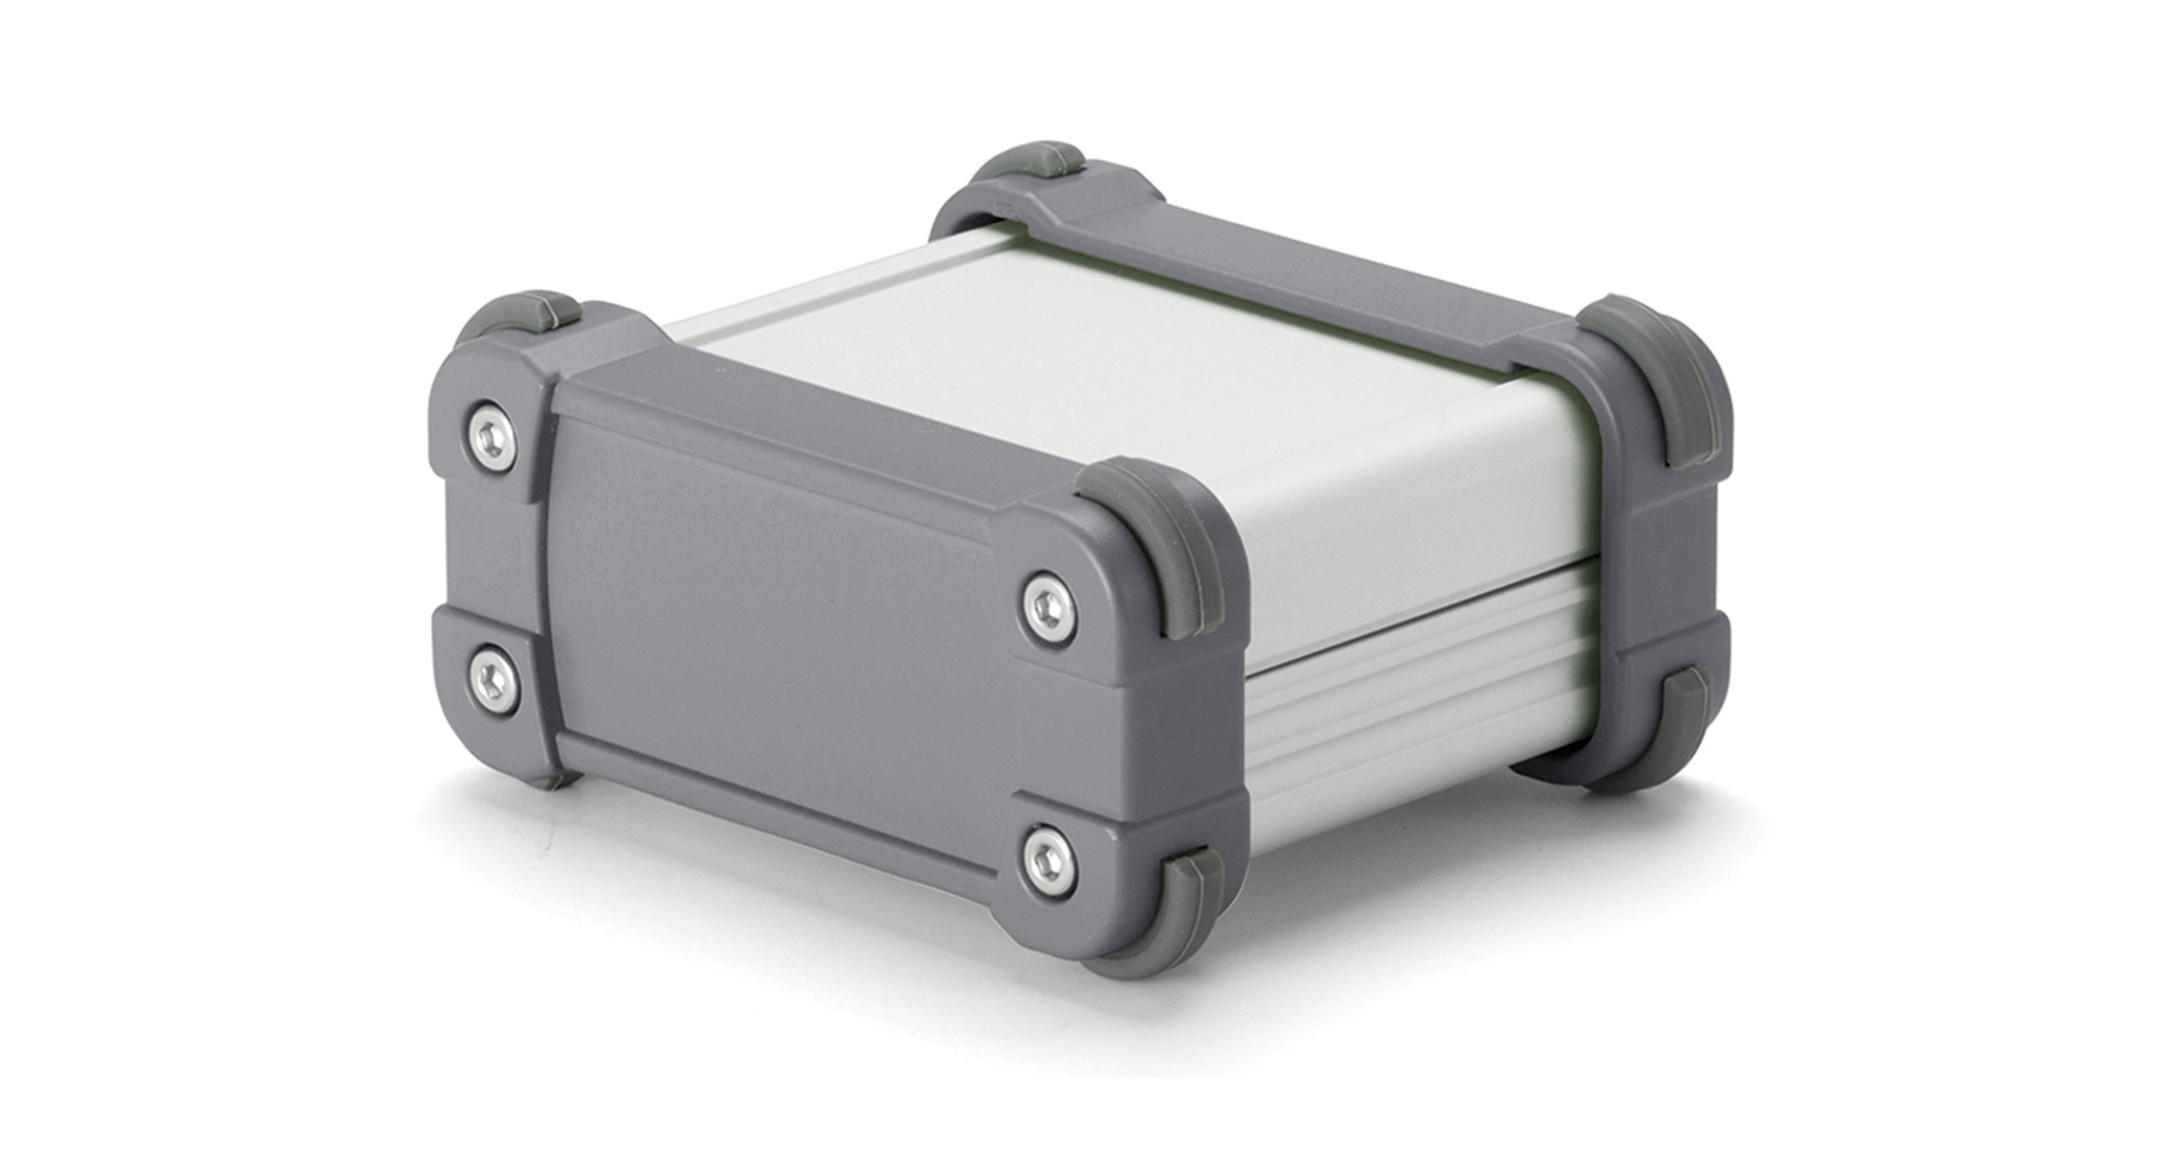 IP65コーナーガード付 防水アルミケース EXWシリーズ:シルバー/グレーの画像